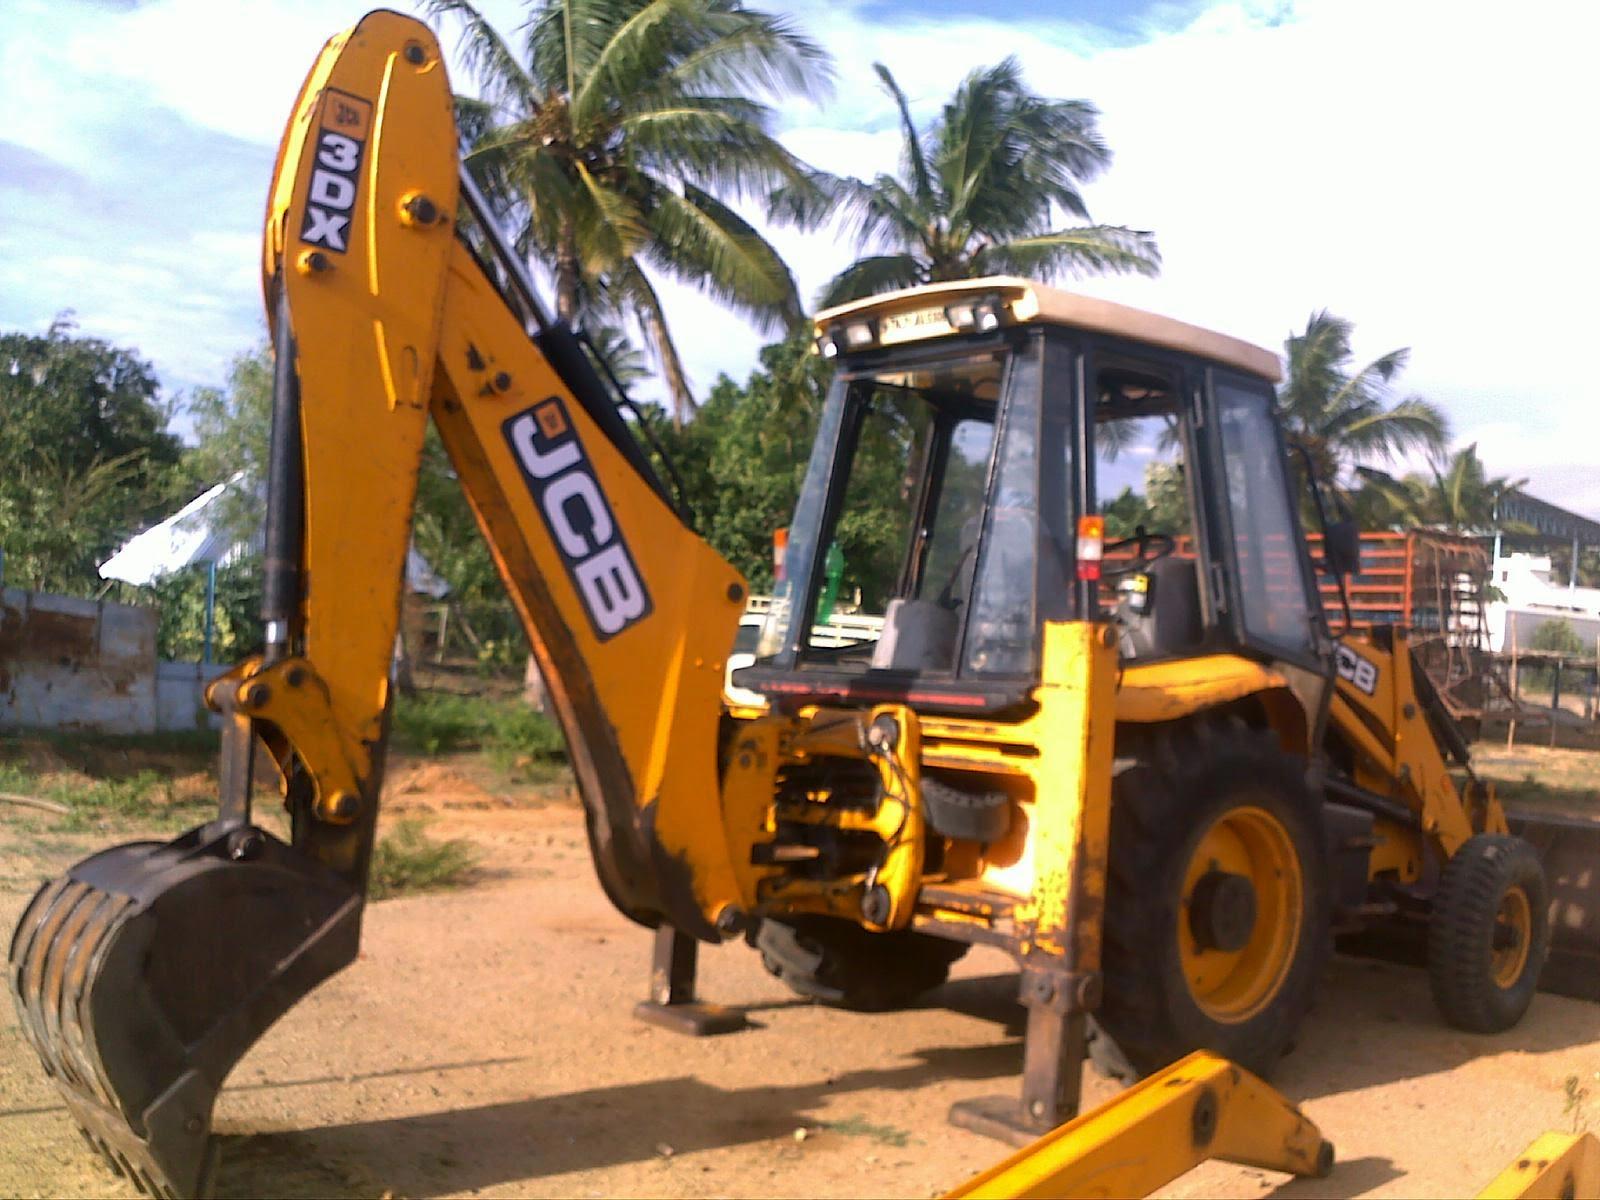 jcb 3dx Jcb 3dx,us $ 35,000 - 36,000 / unit, india, jcb india, jcb 3dx excavator loadersource from om power engineers on alibabacom.